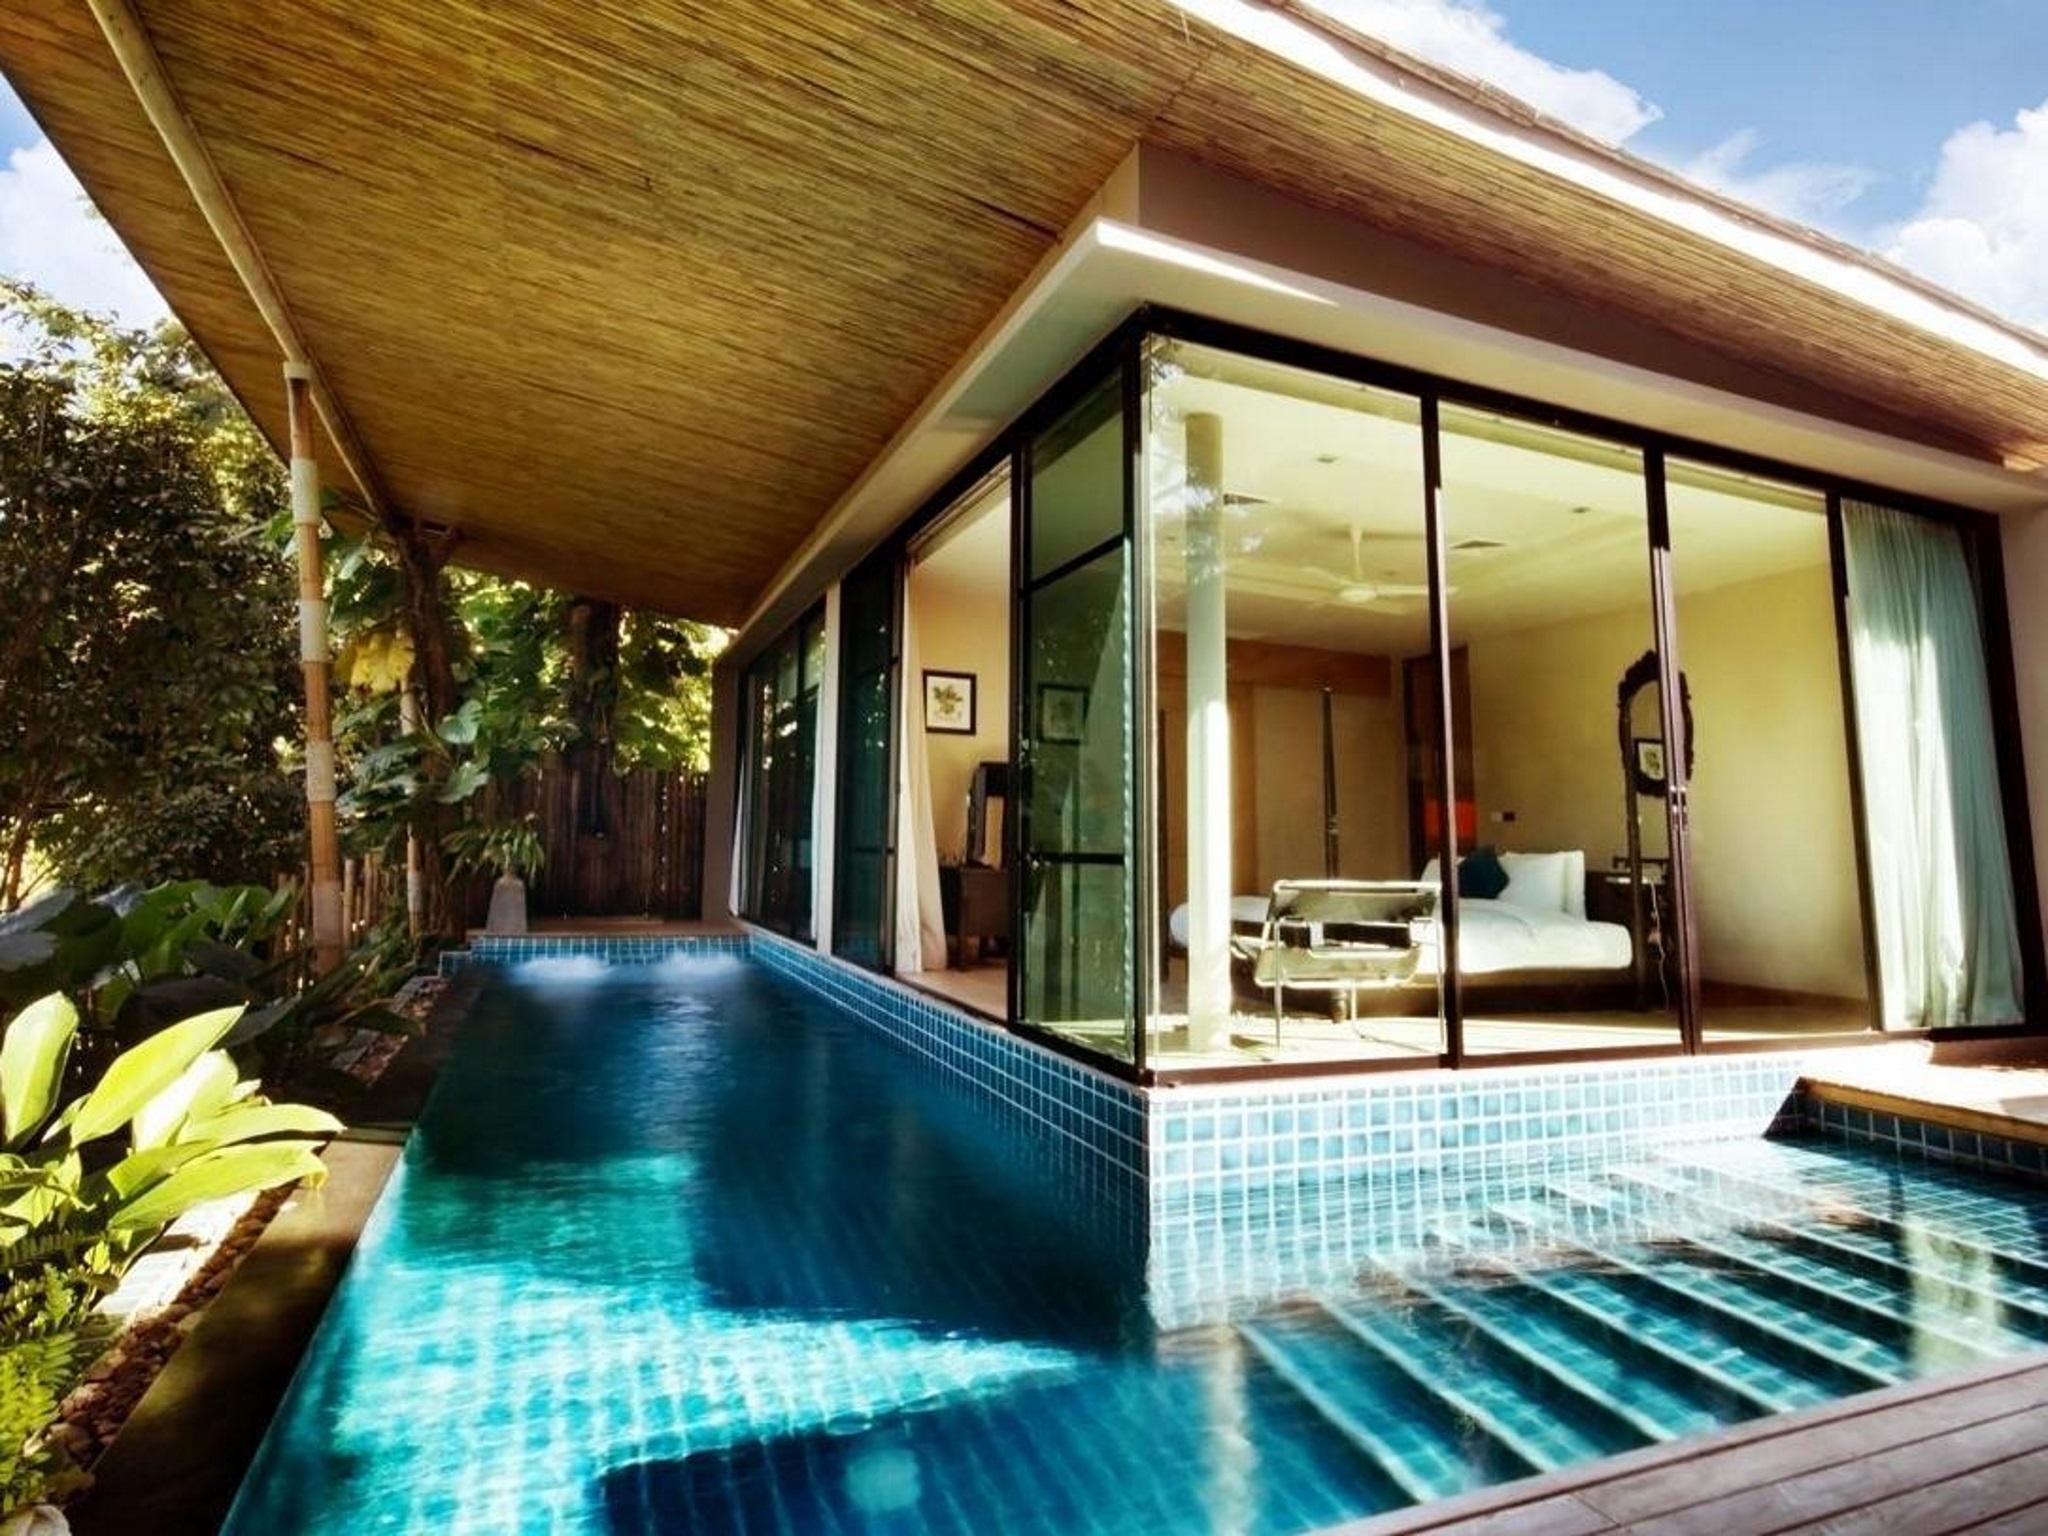 Canary Natural Resort